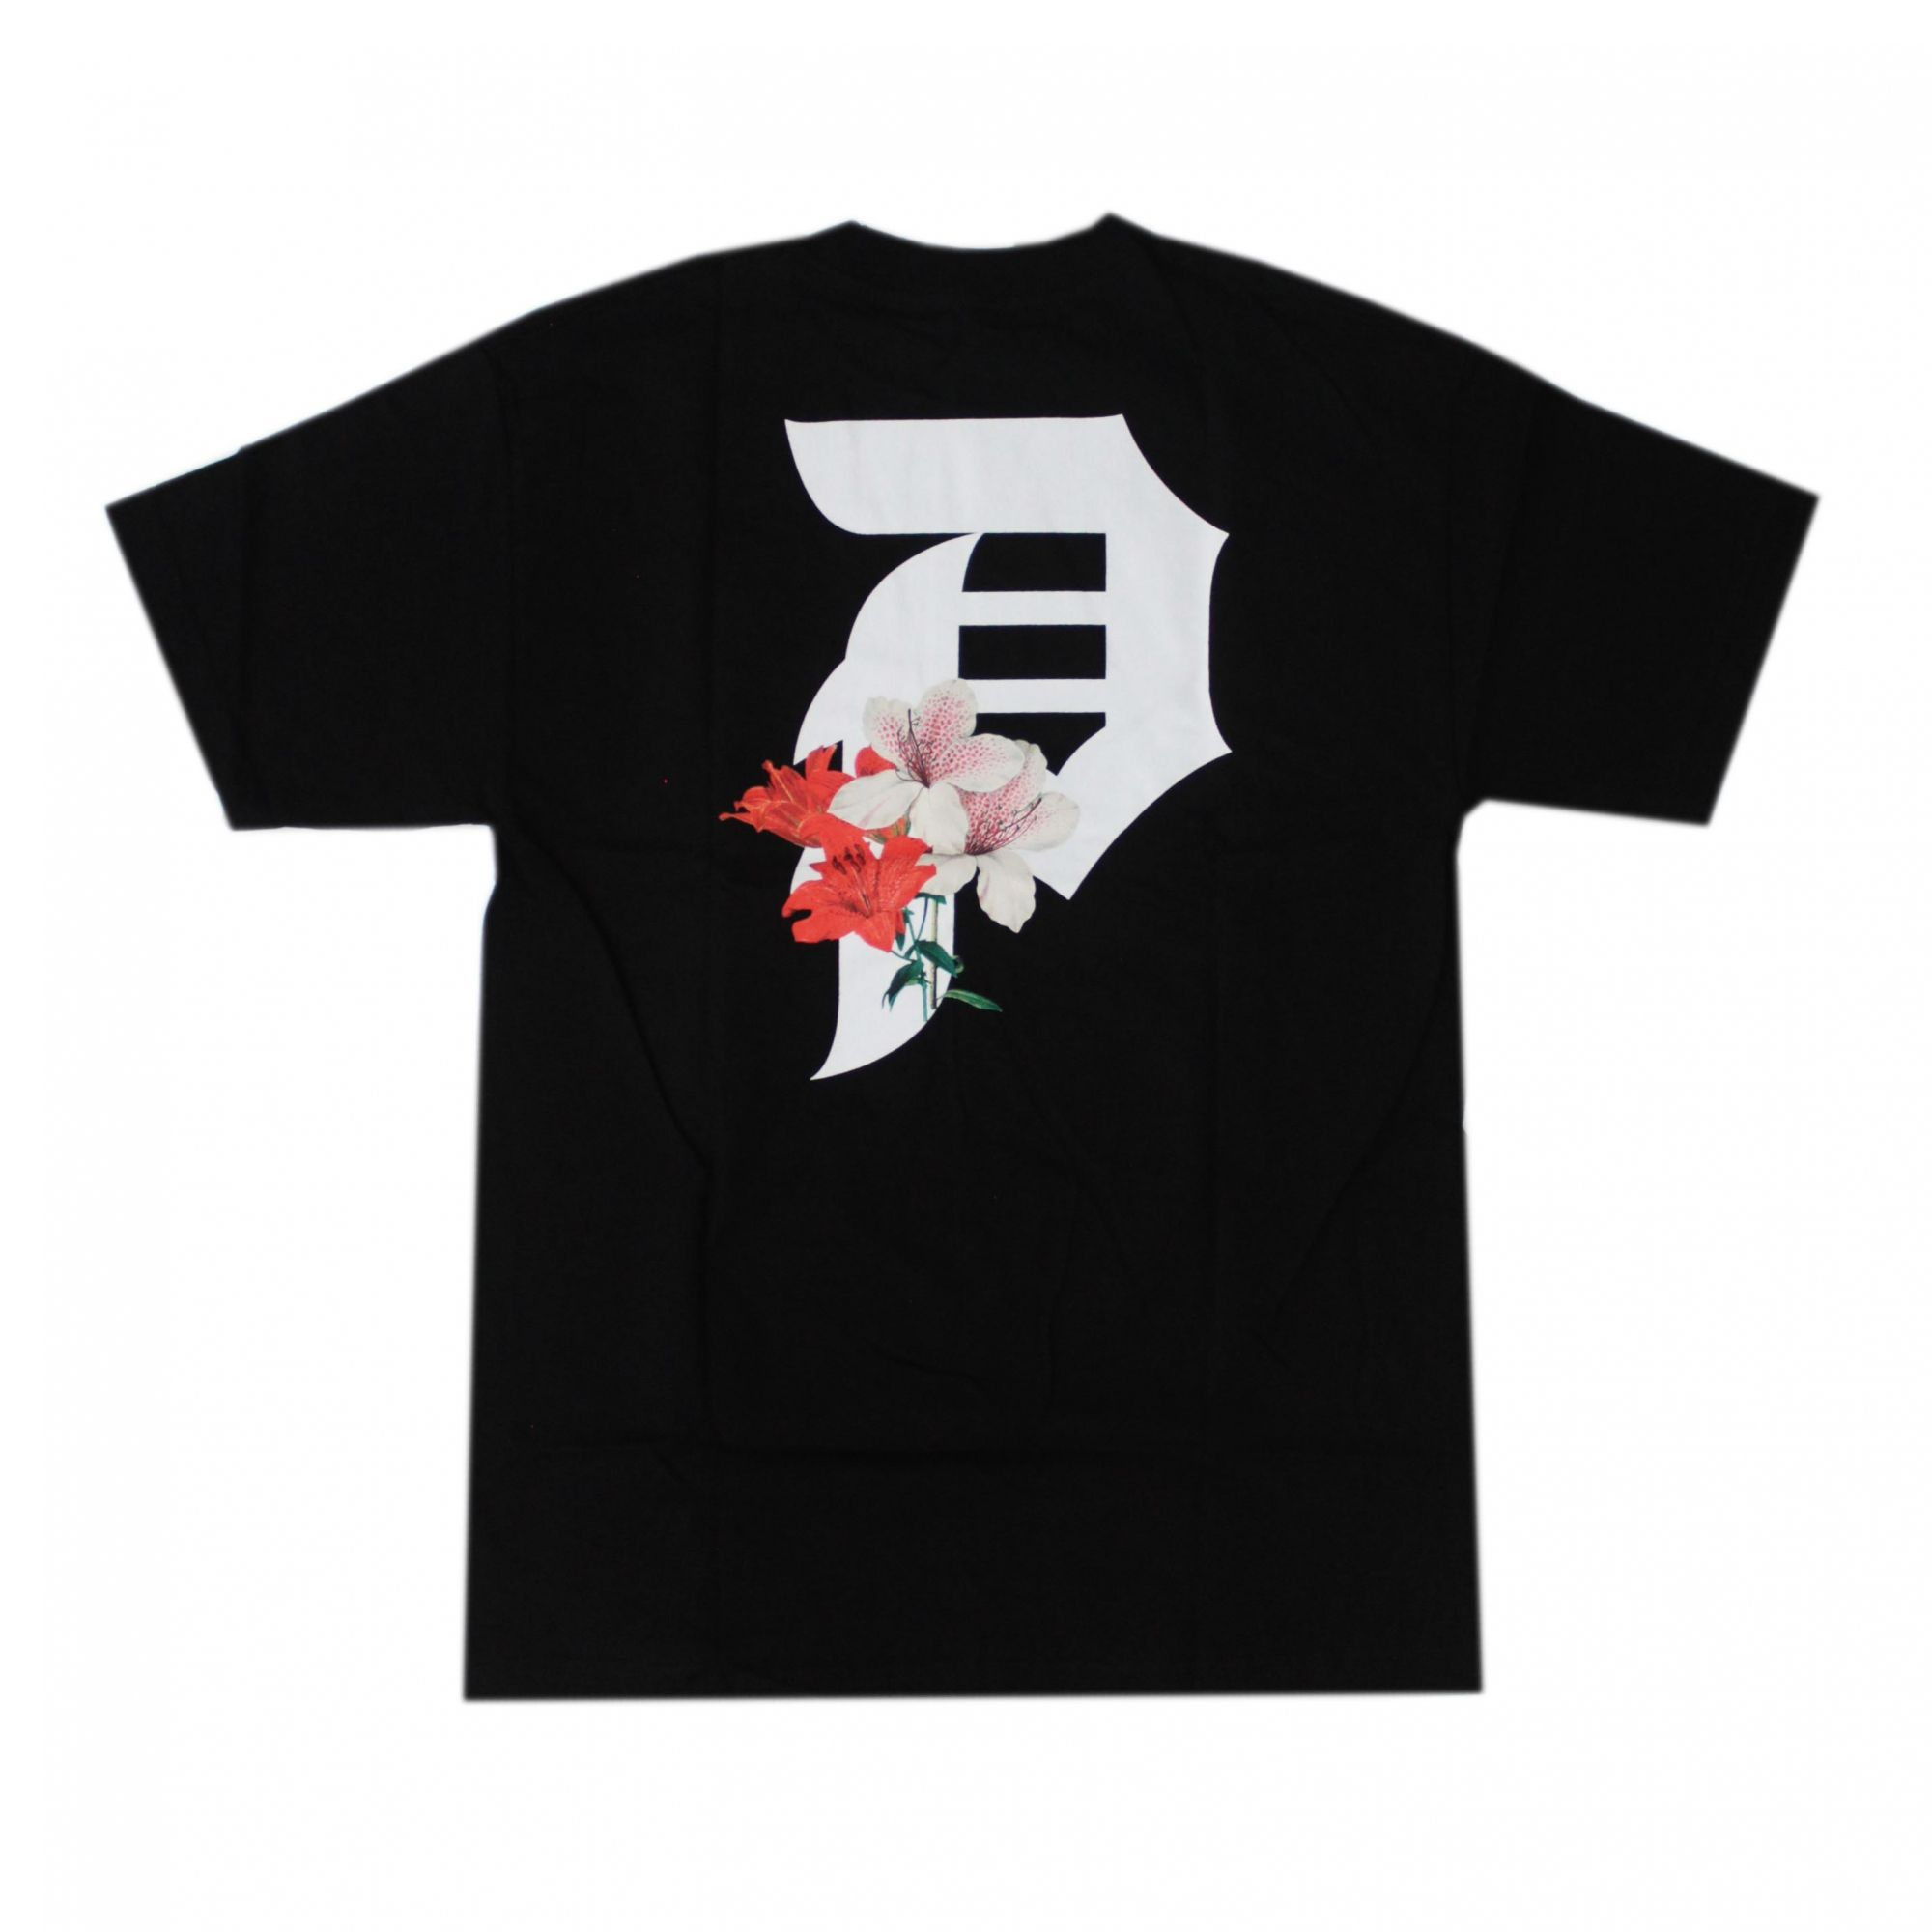 Camiseta Primitive Dirty P Casual Tee Preto P Lily Tee Preto (Importado)